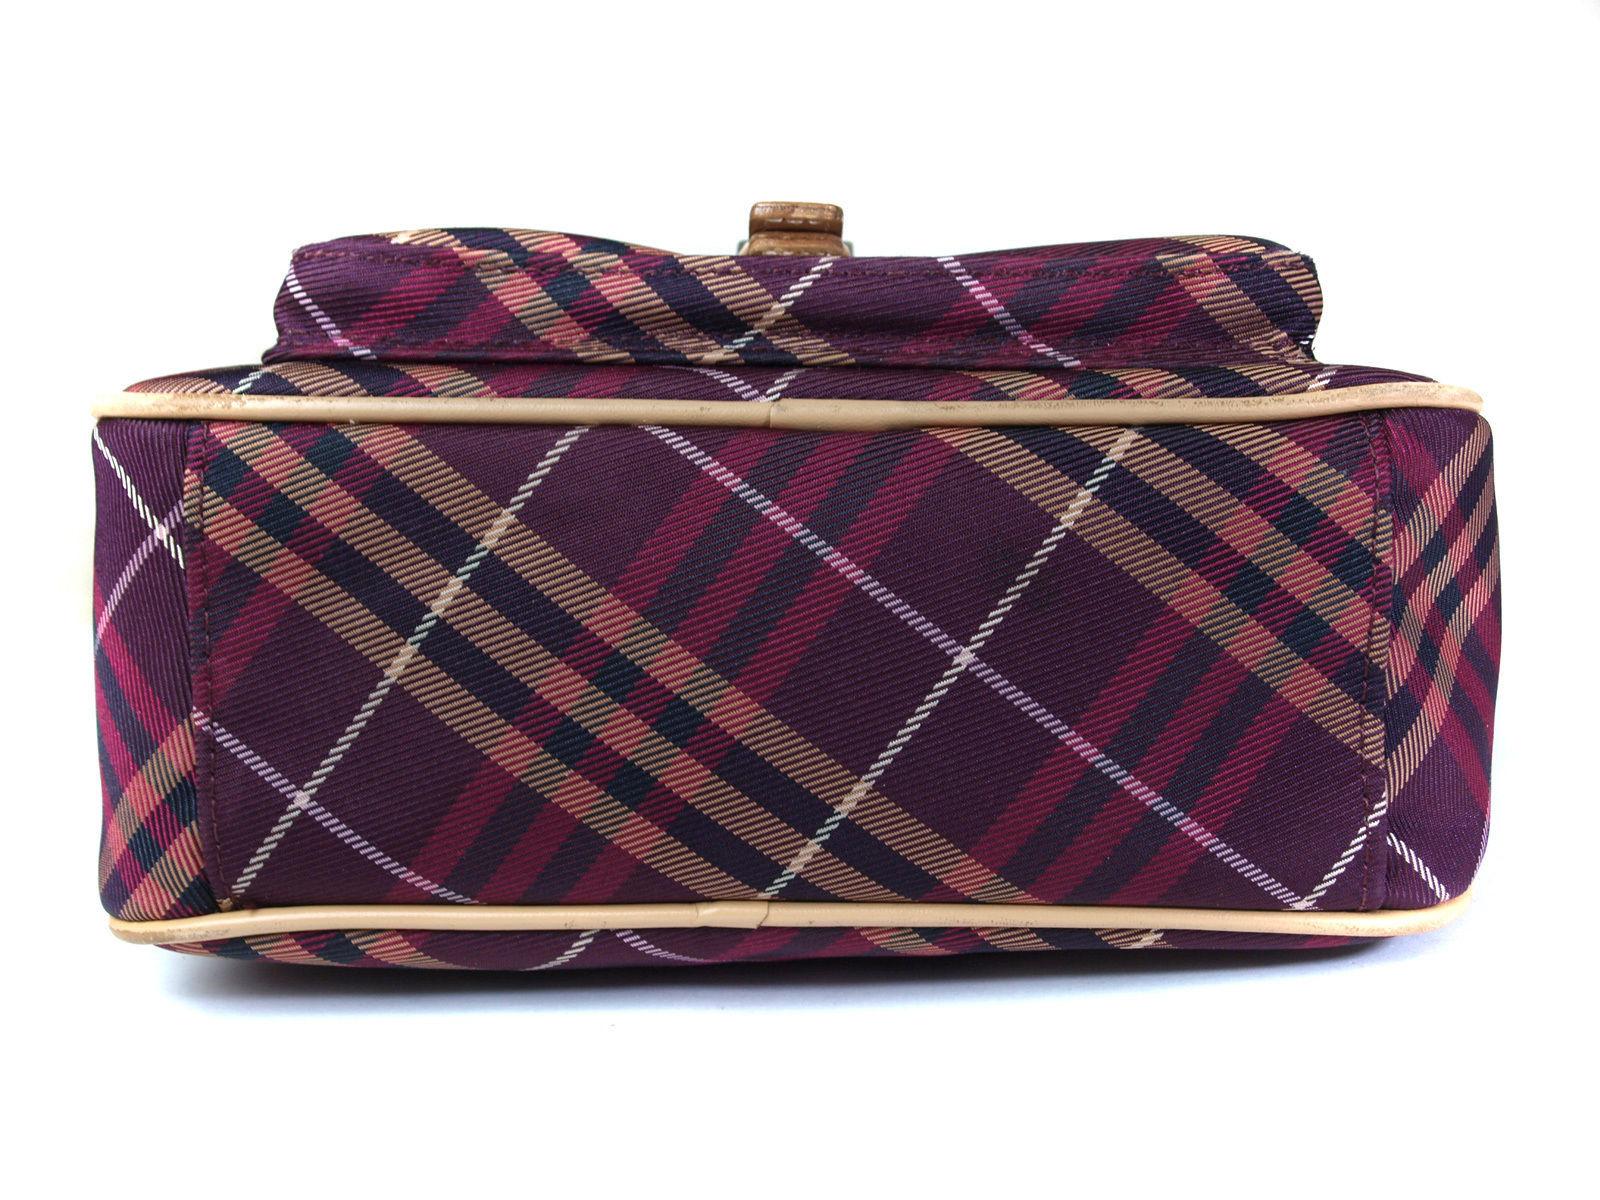 23234ce01729 ... Auth BURBERRY LONDON BLUE LABEL Canvas Leather Cross-Body Shoulder Bag  ...